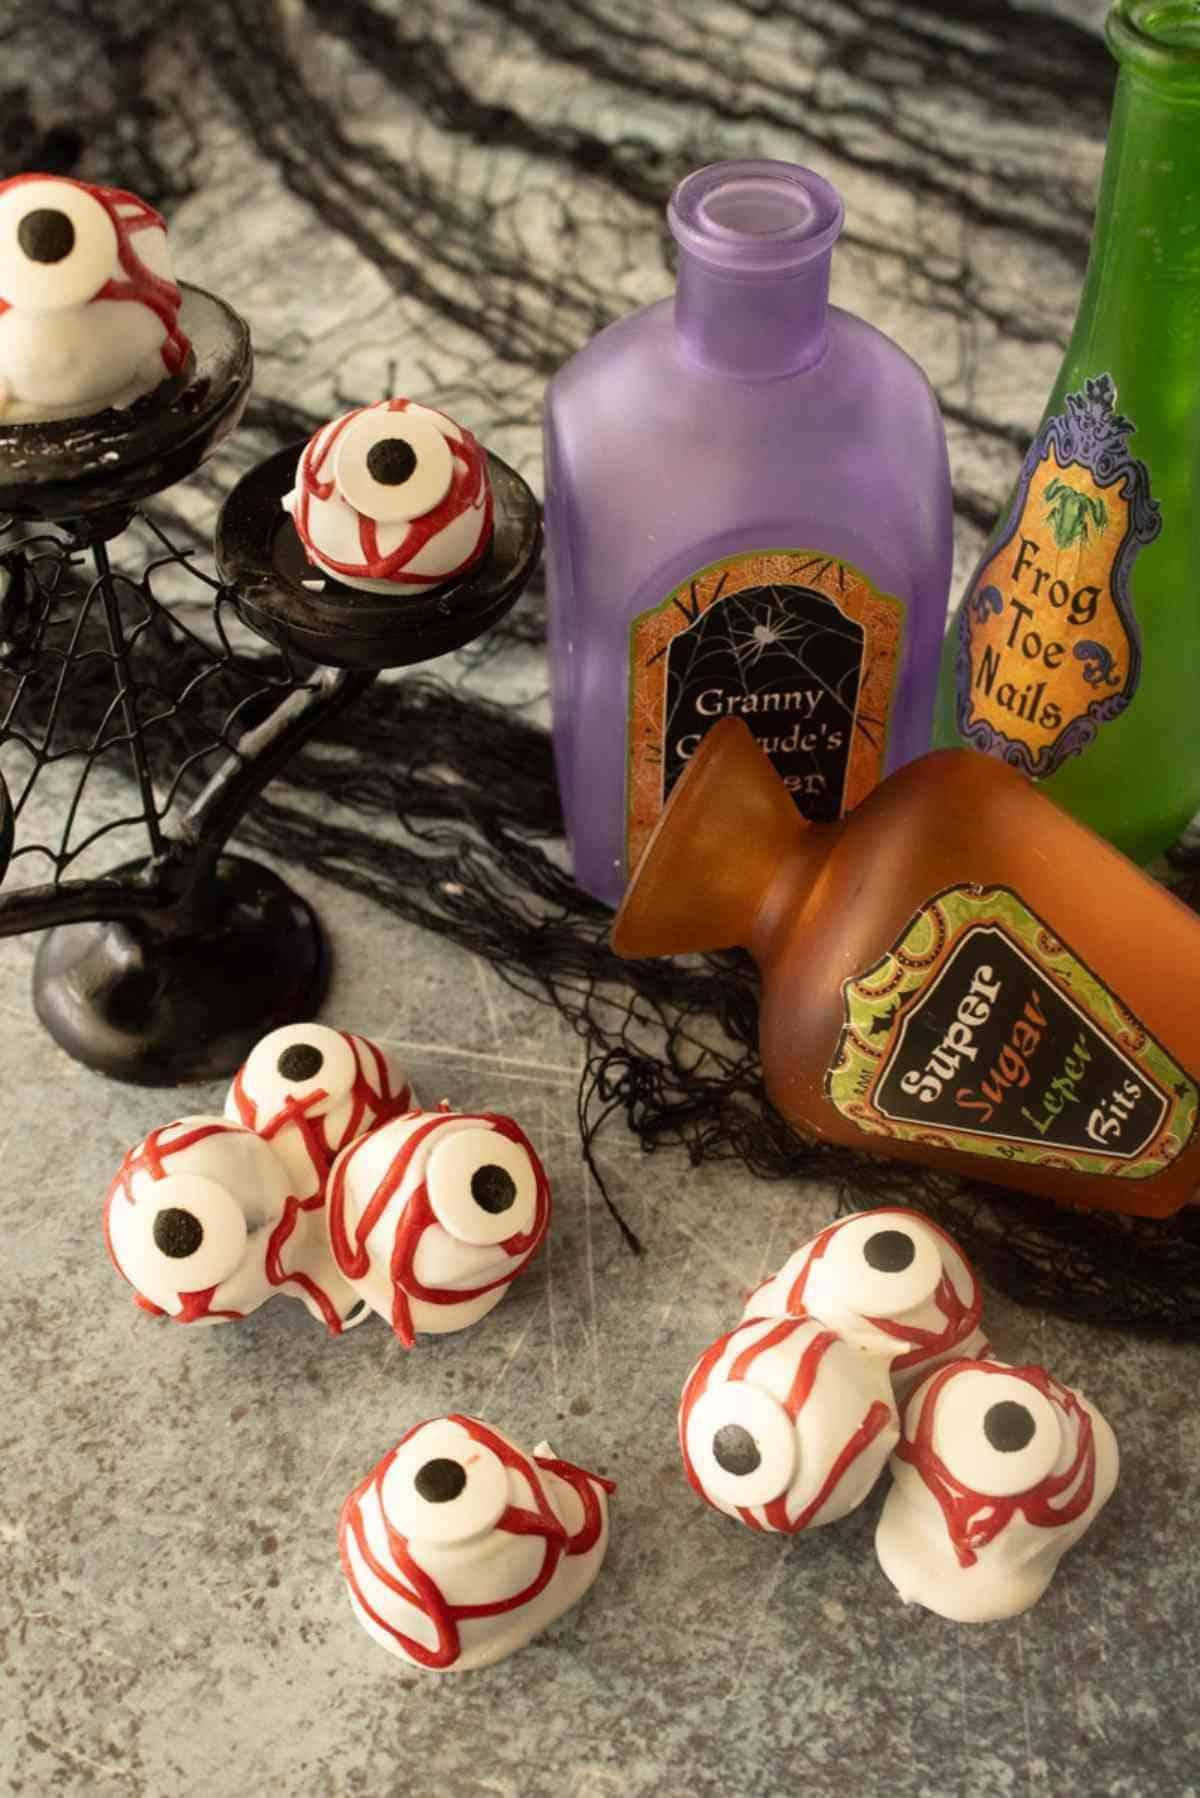 Scary Oreo eyeballs next to potion bottles.